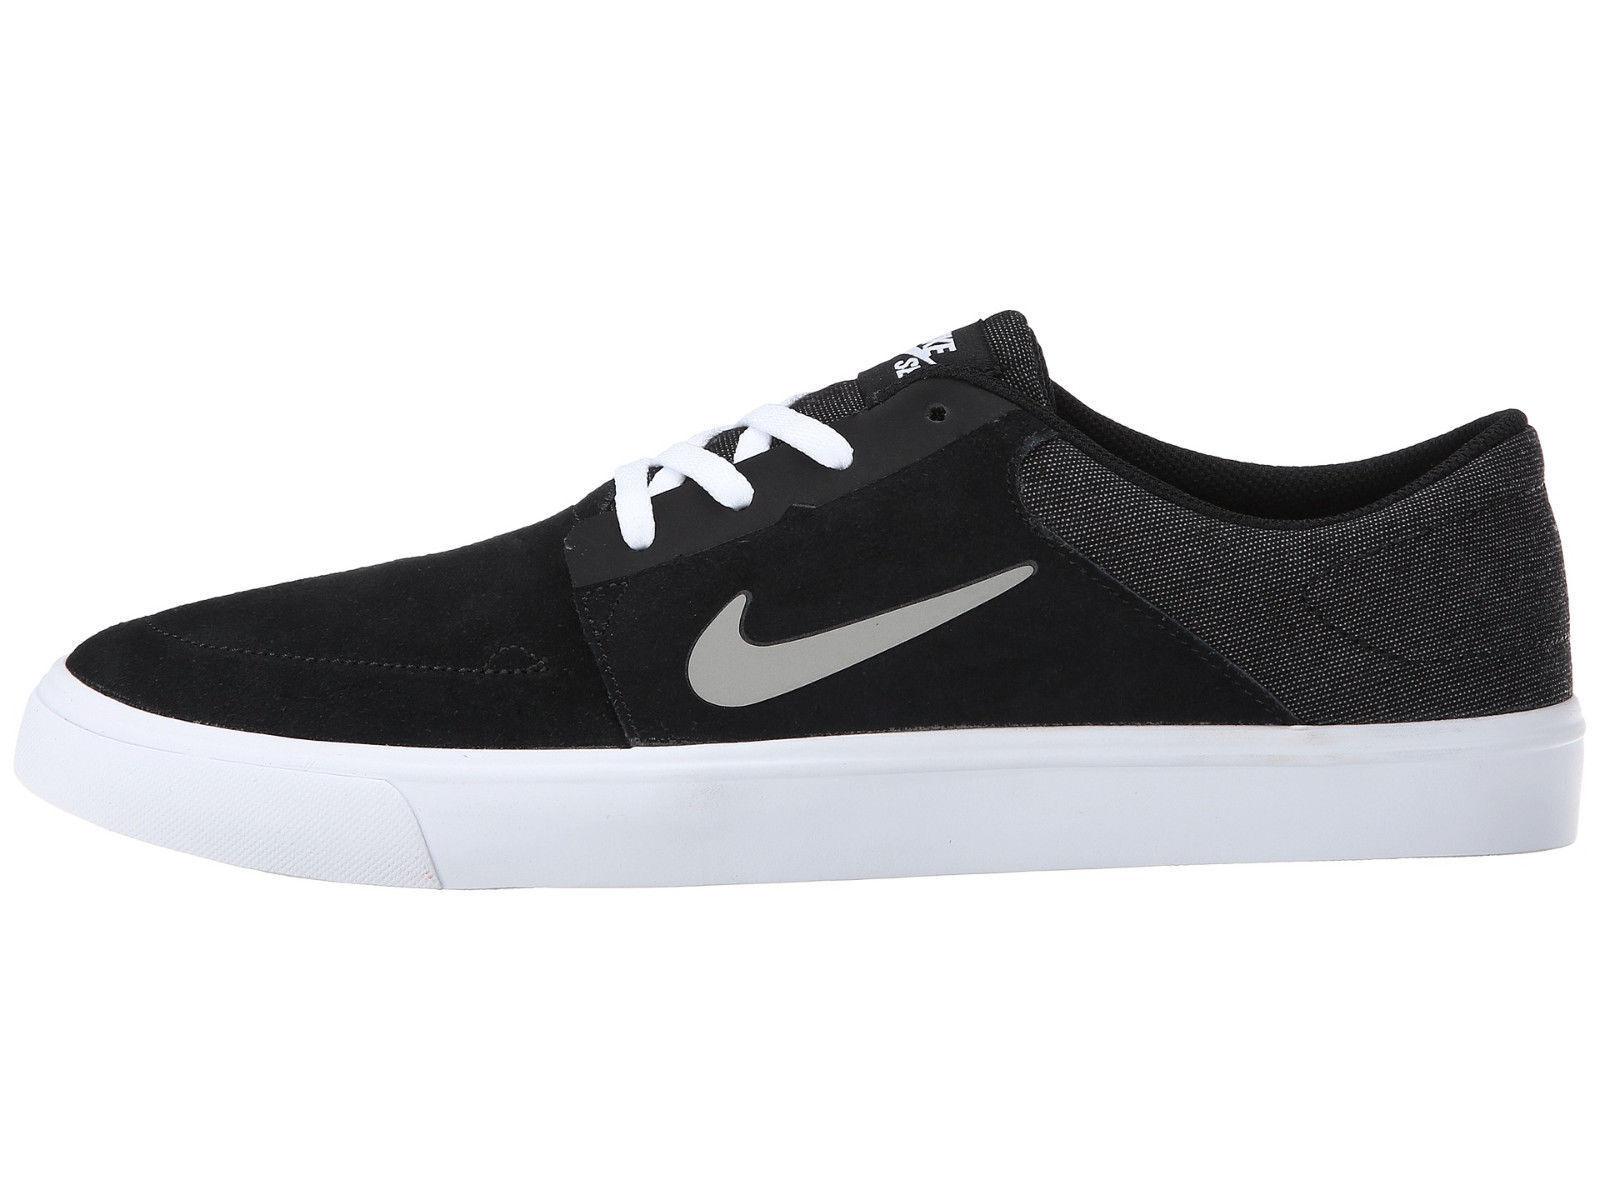 NIKE SB PORTMORE Sneaker Hombres Zapatos 725027001  de Skate Negro/Blanco 725027001 Zapatos Nuevo acbc28